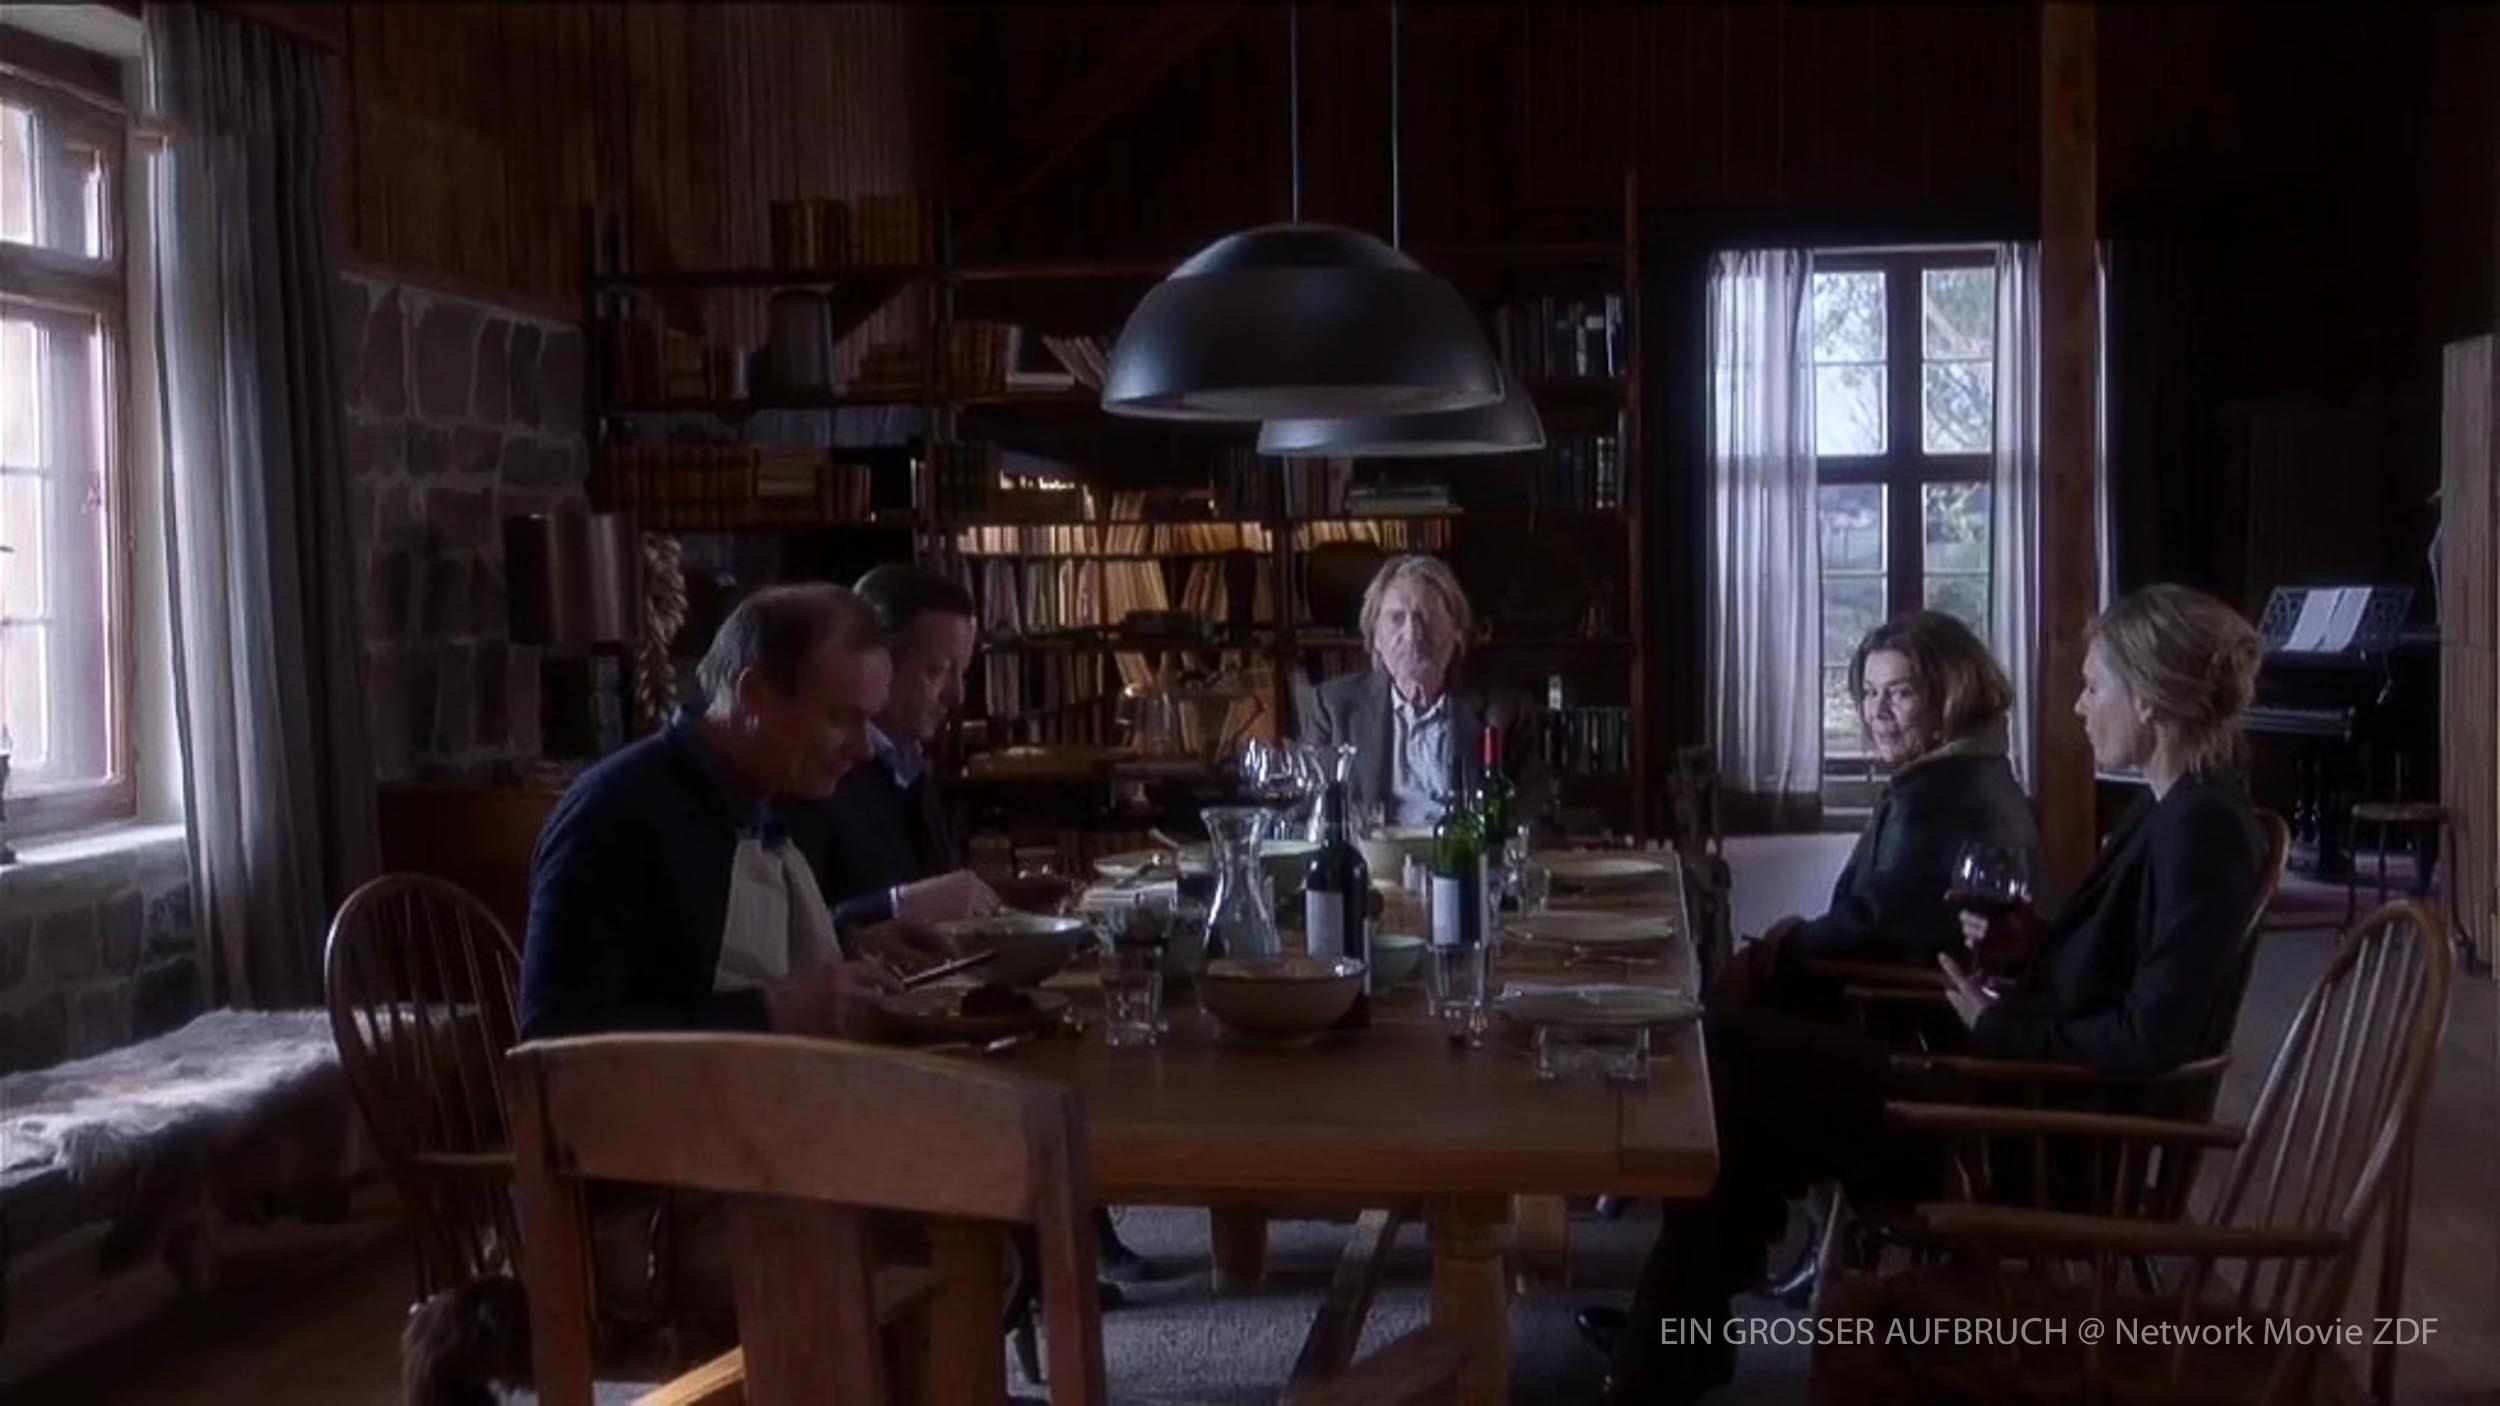 EIN GROSSER AUFBRUCH Regie Matti Geschonneck Szenenbild Thomas Freudenthal-20.jpg